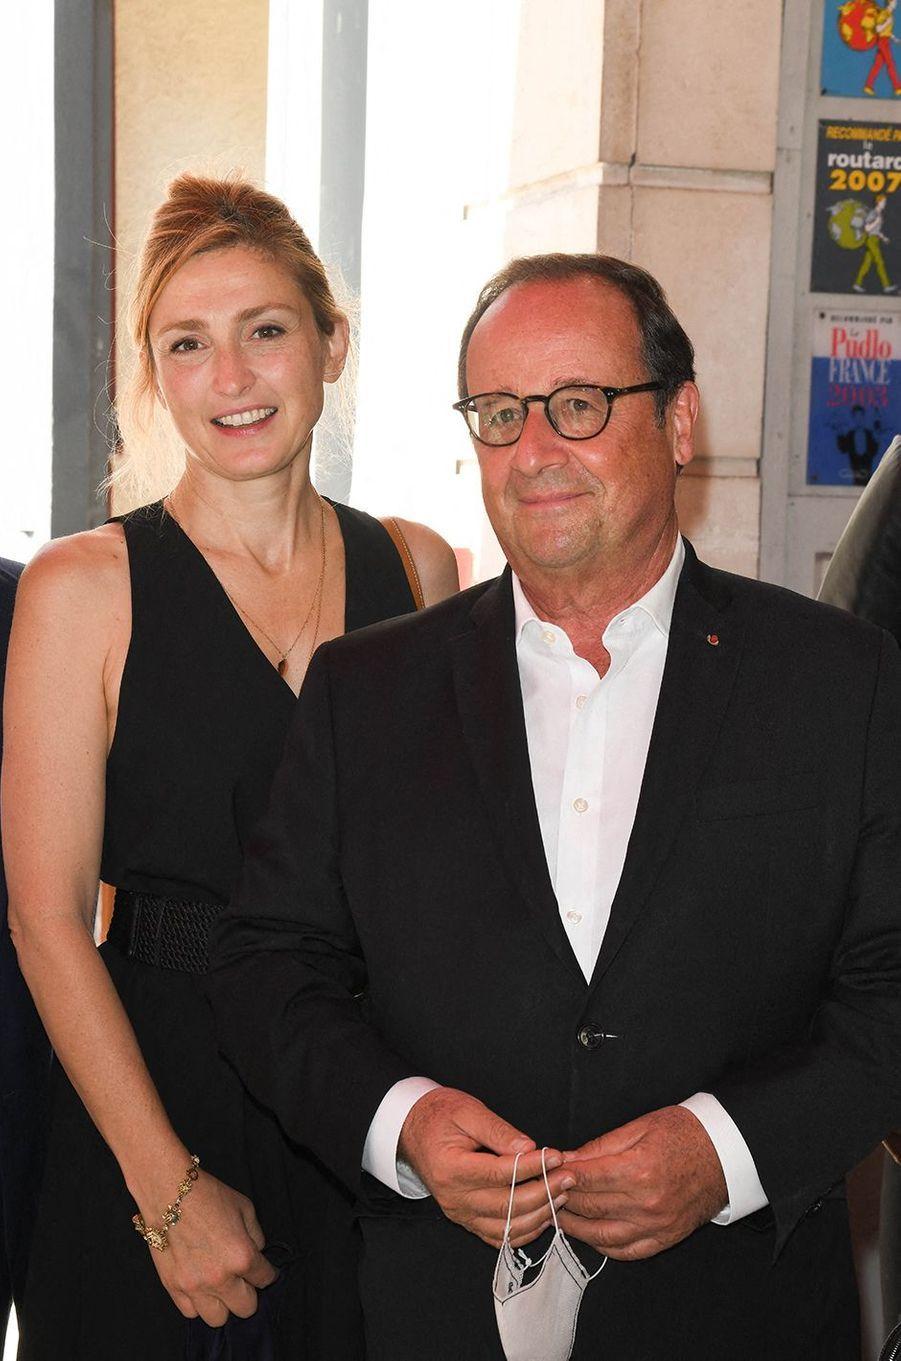 Julie Gayet et François Hollande au Festival du film francophone d'Angoulême le 1er septembre 2020